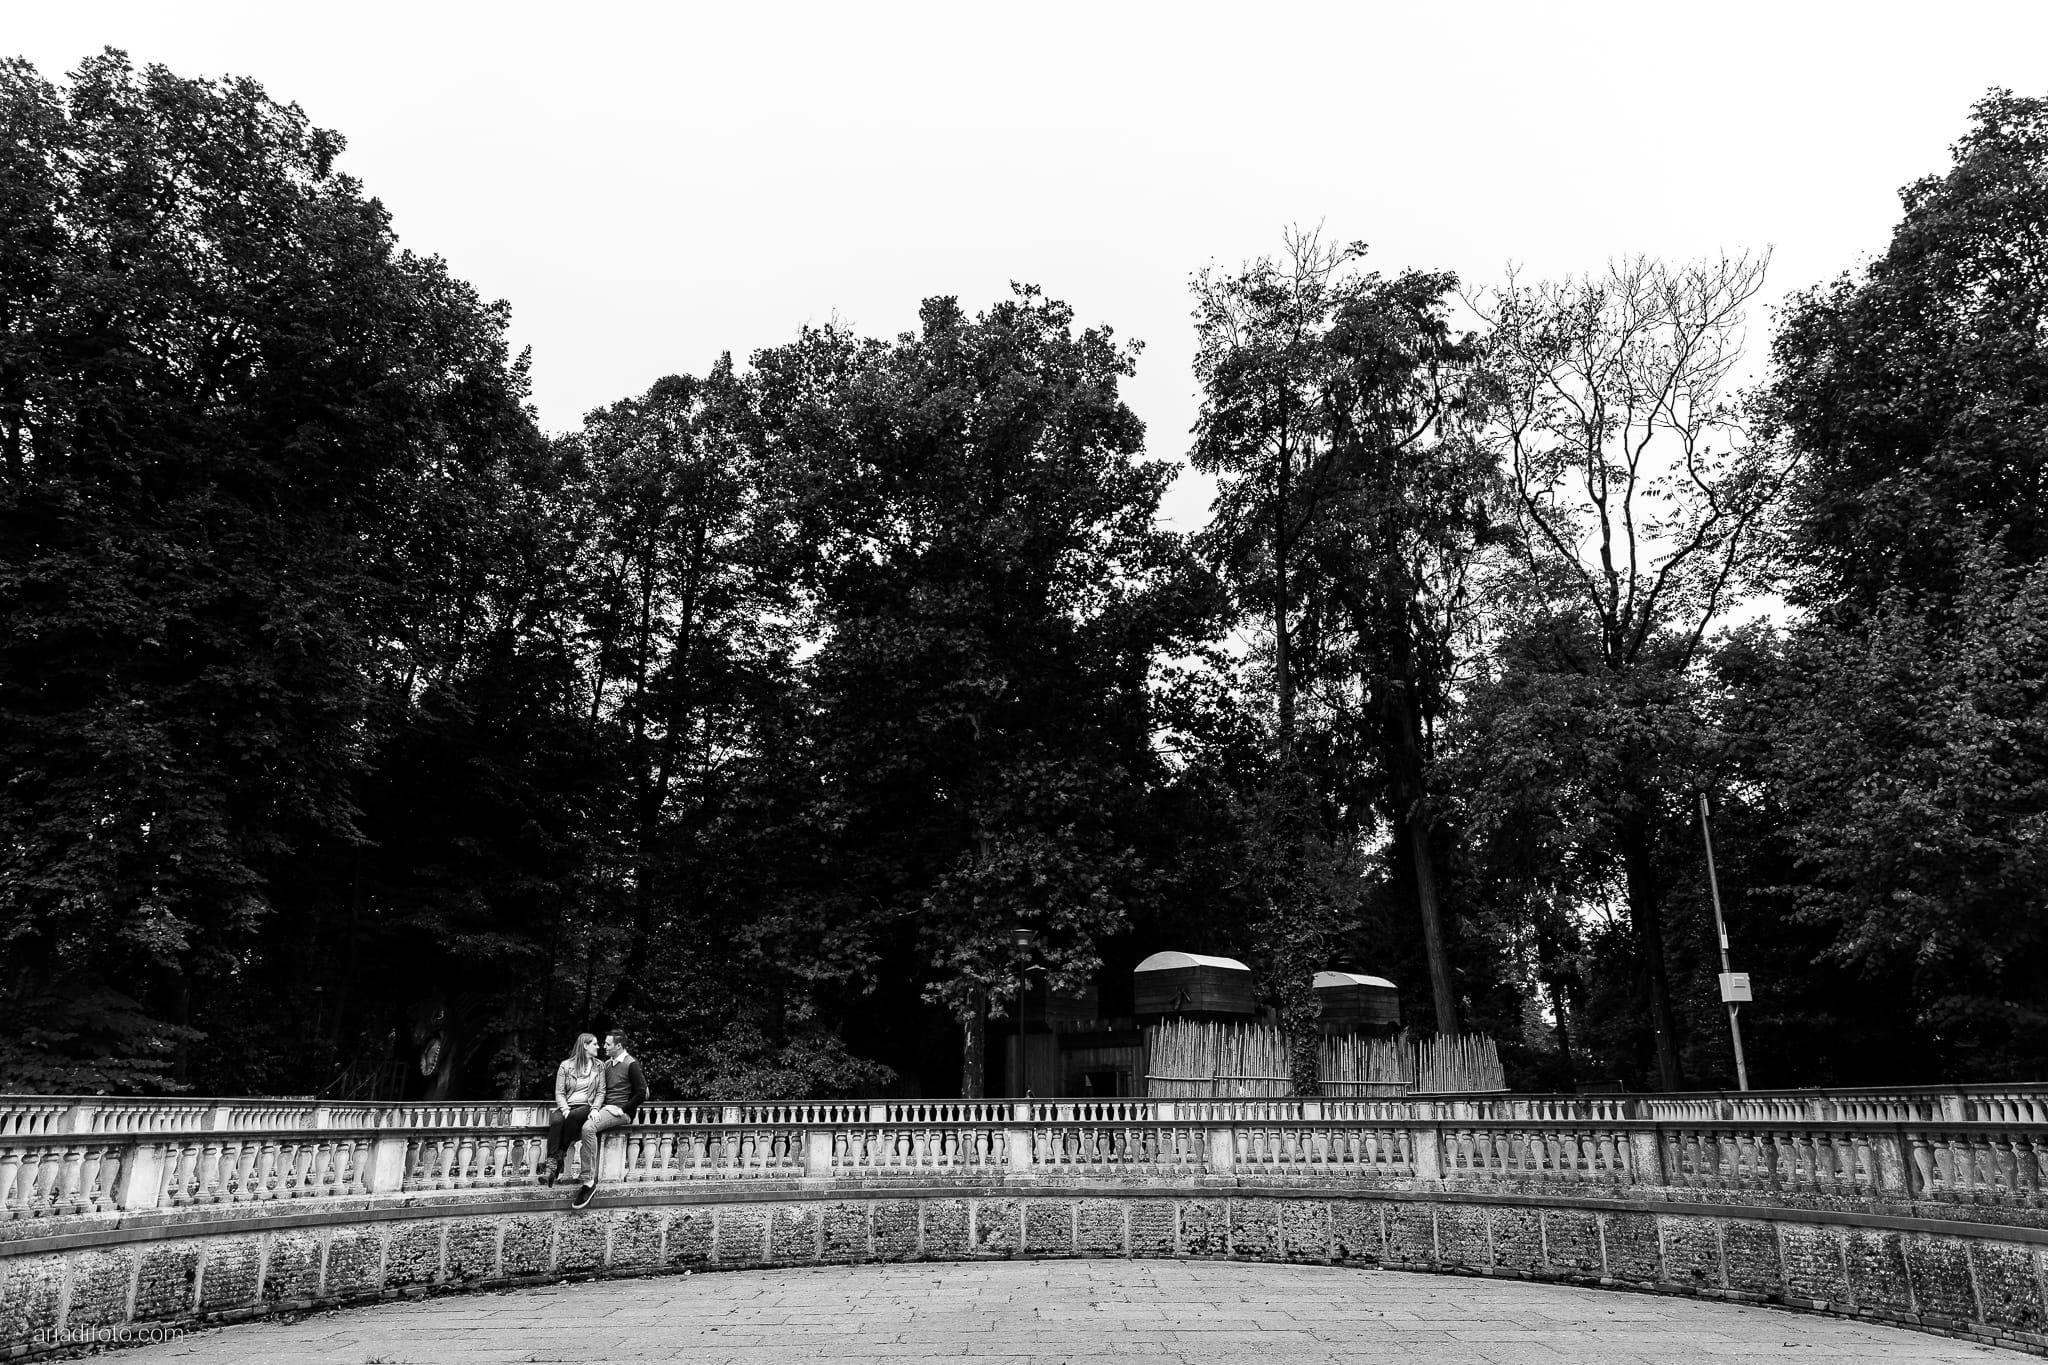 Laura Daniele Prematrimoniale Parco Alberi Parlanti Lungo Sile Treviso